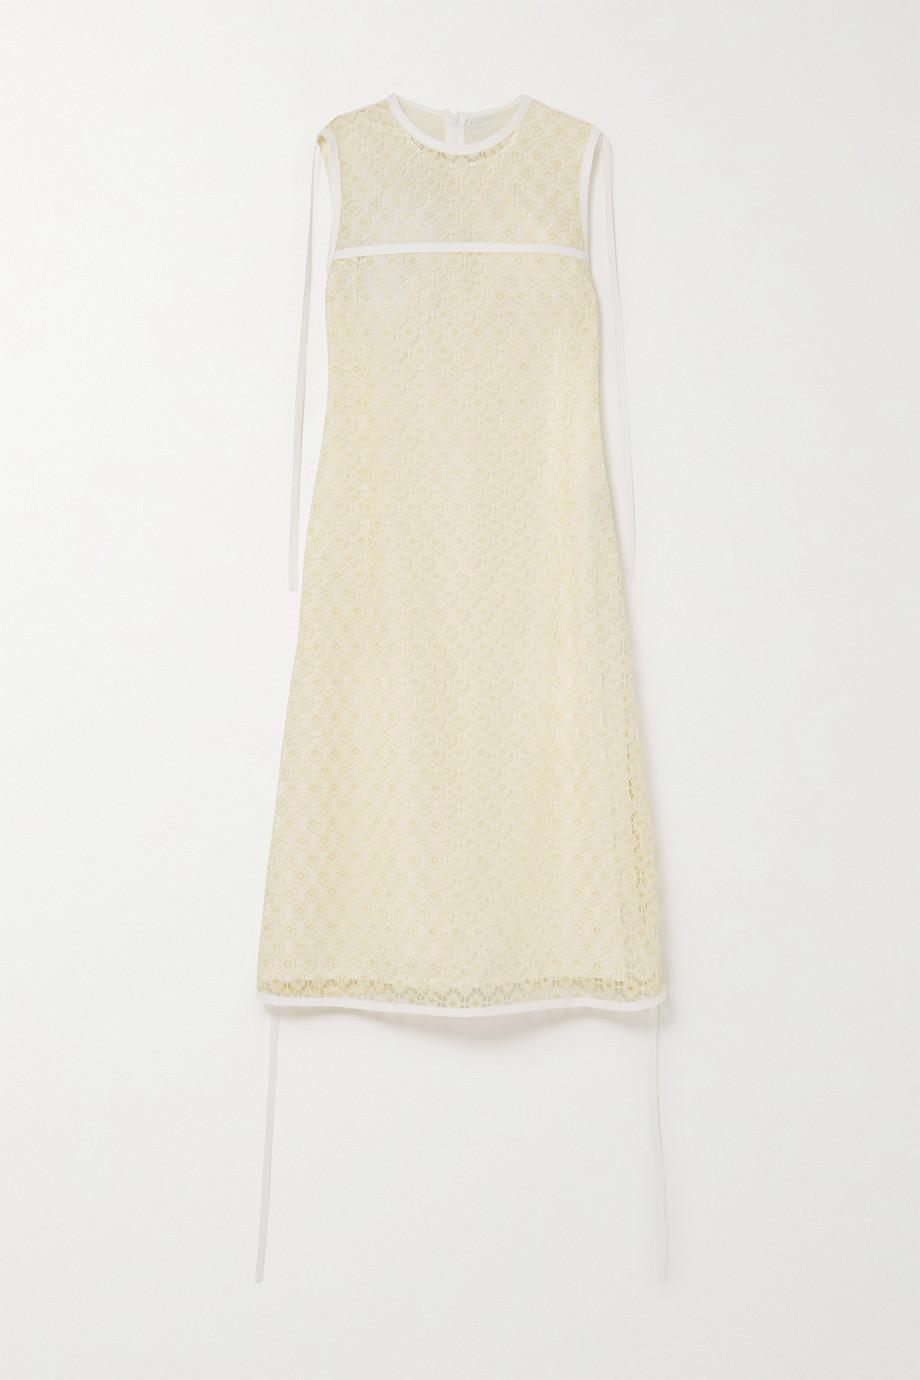 Loewe 系带细节蕾丝连衣裙